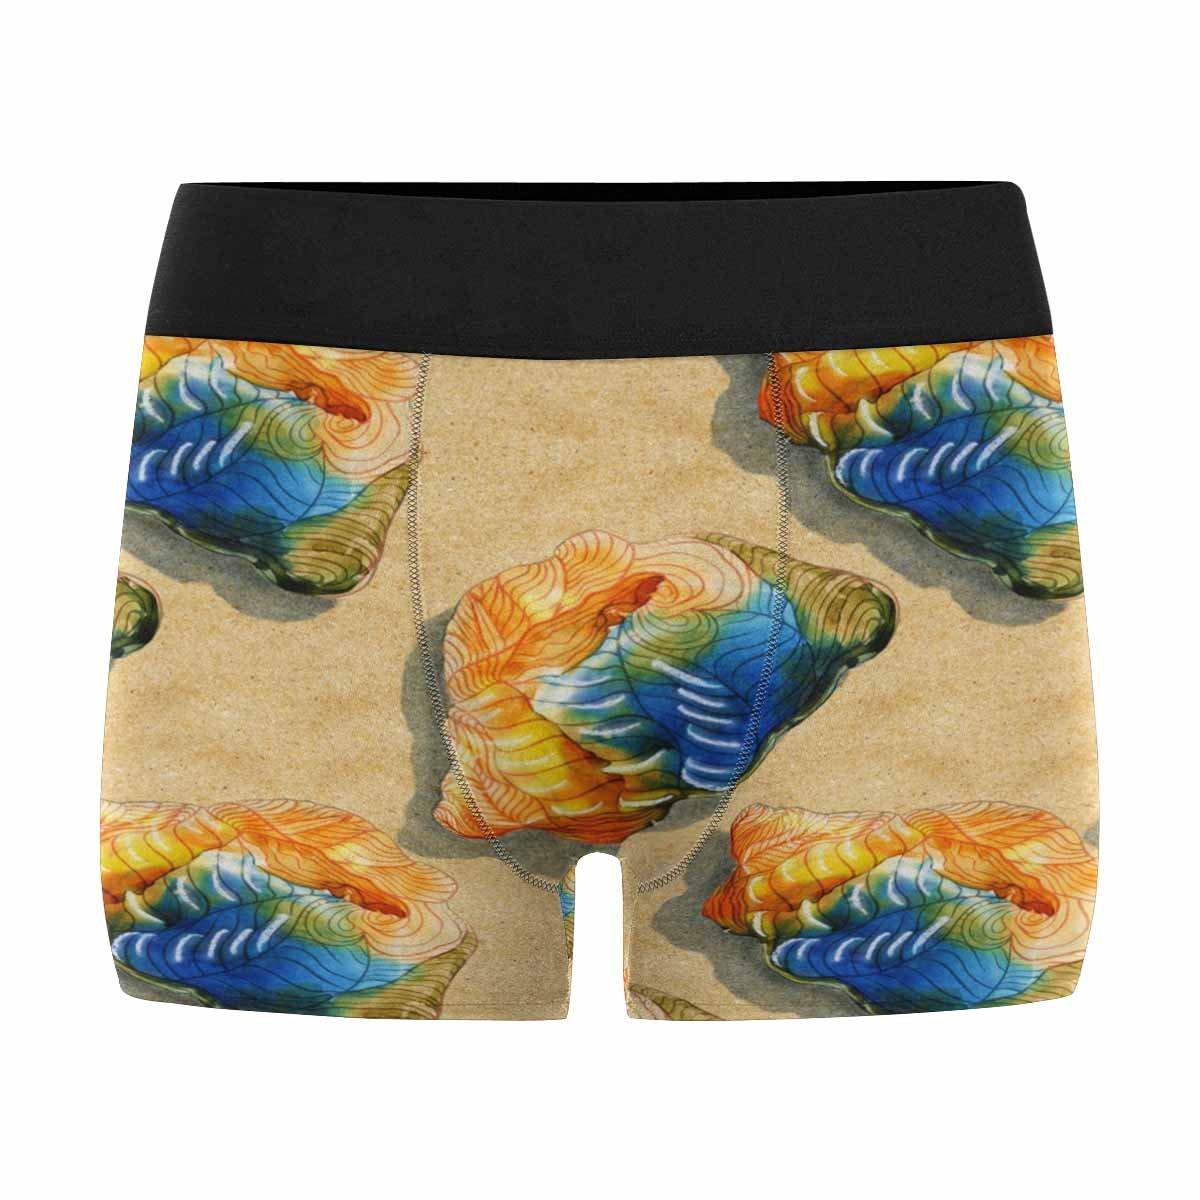 INTERESTPRINT Mens Boxer Briefs Underwear Exotic Tropical Shell on The Sandy Beach XS-3XL